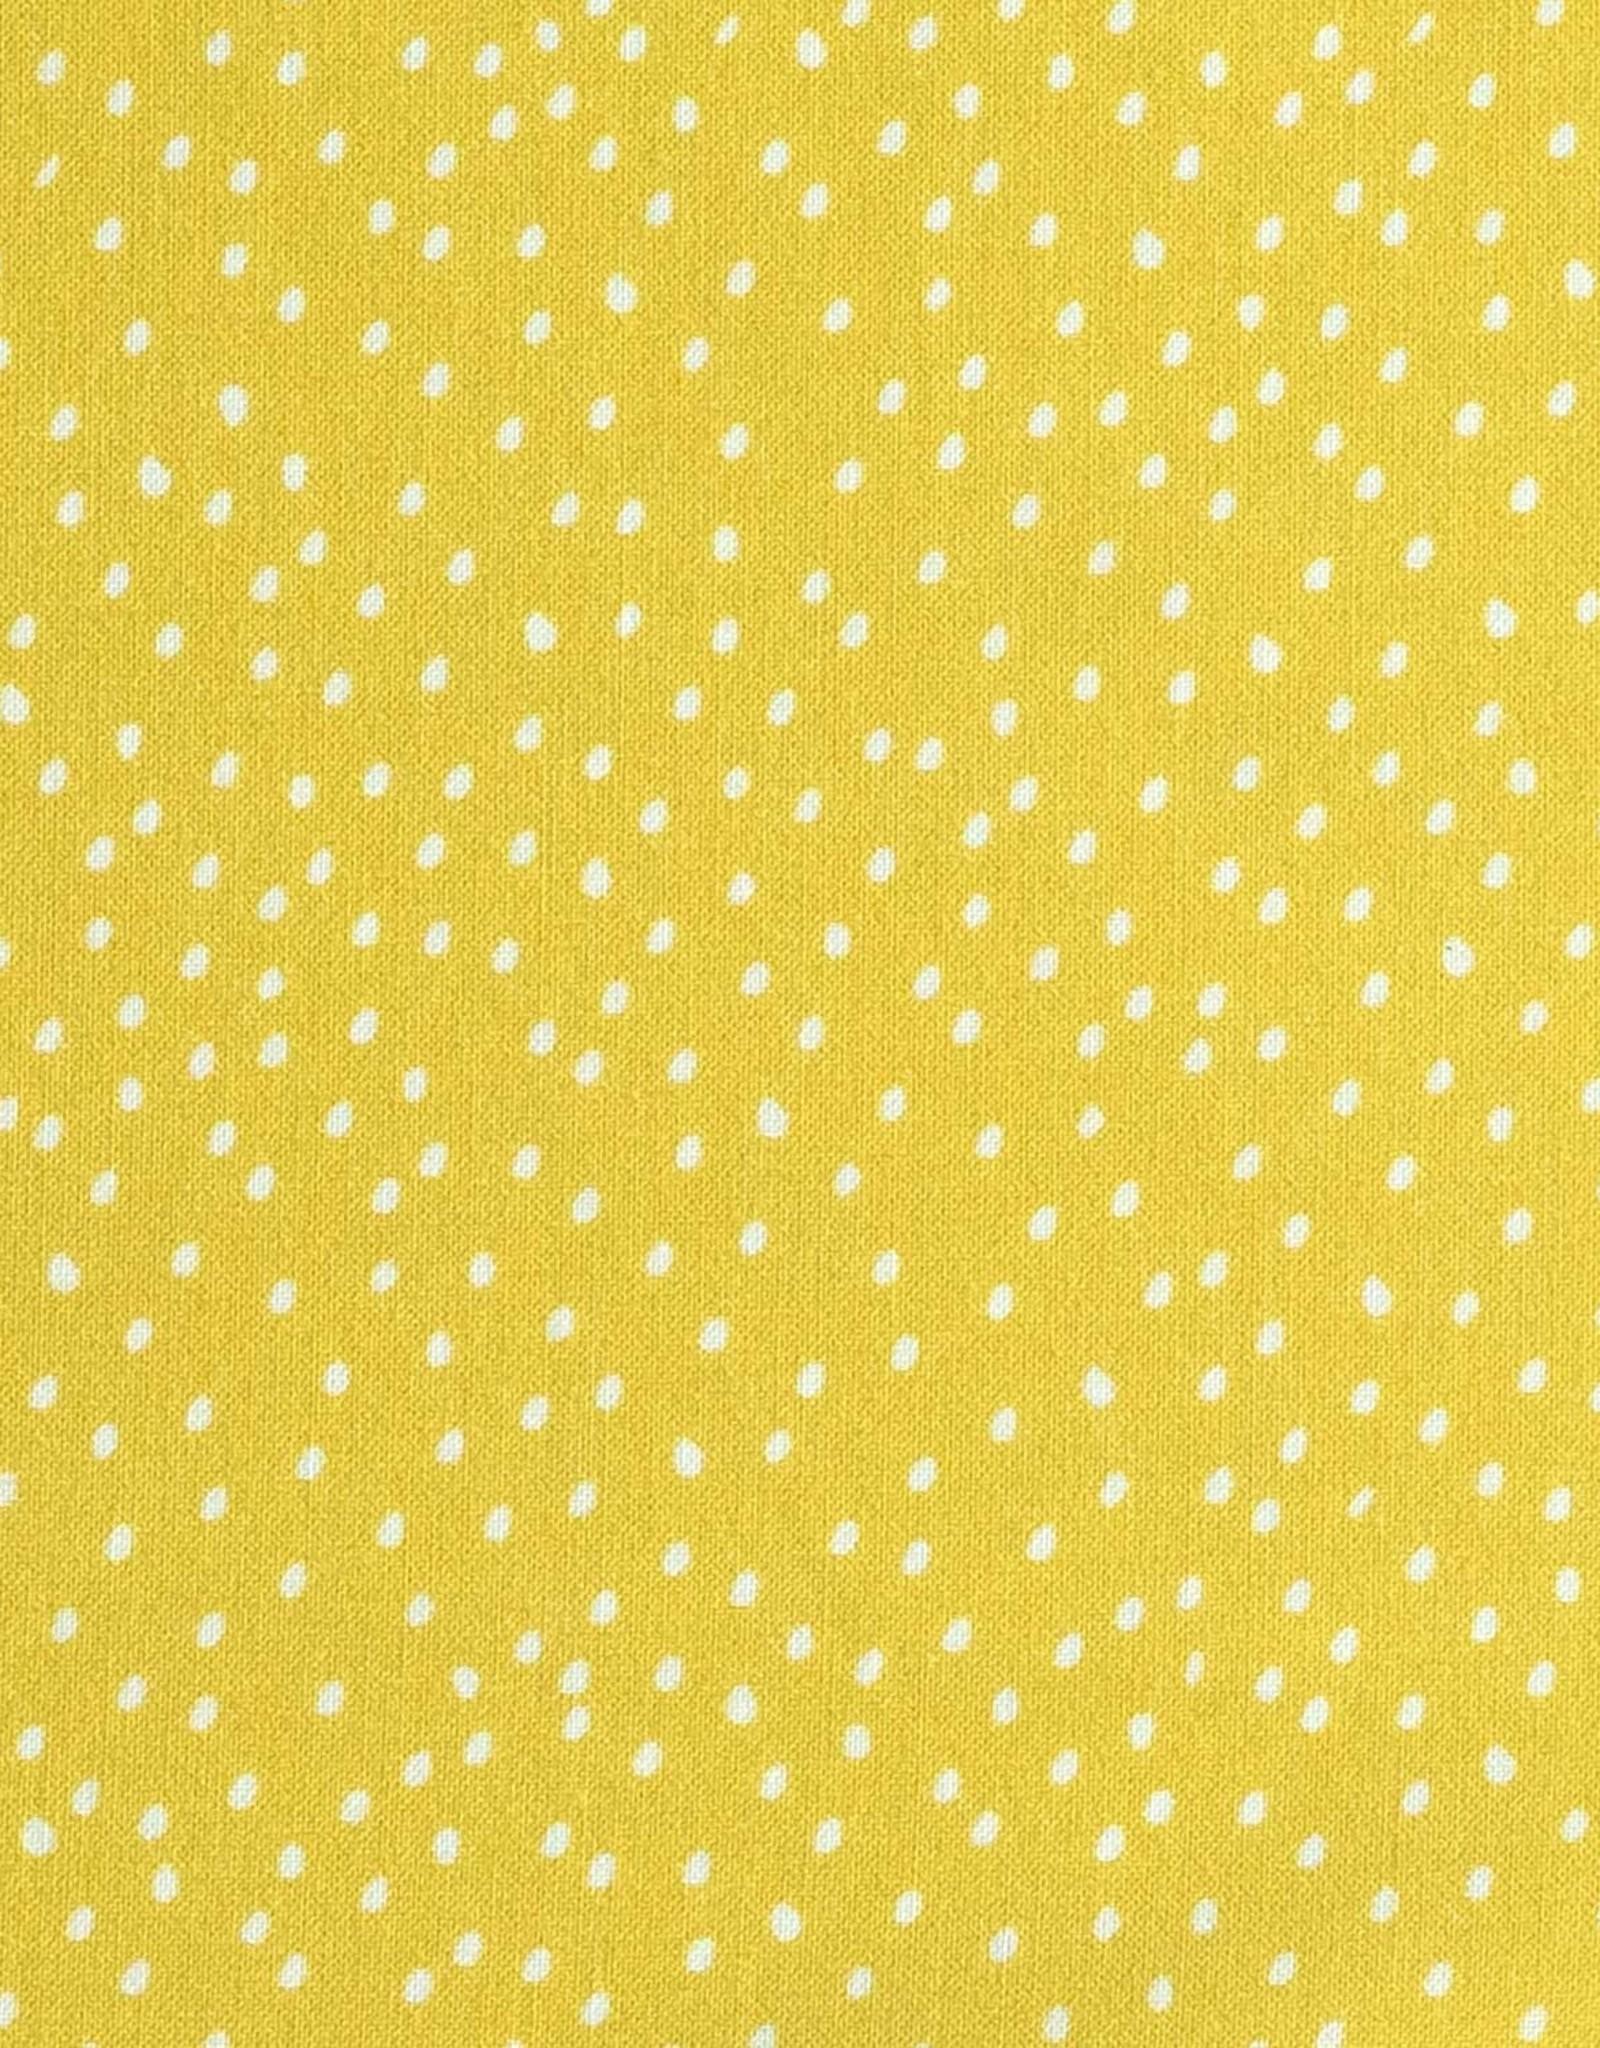 Katia Poplin into the river coord yellow